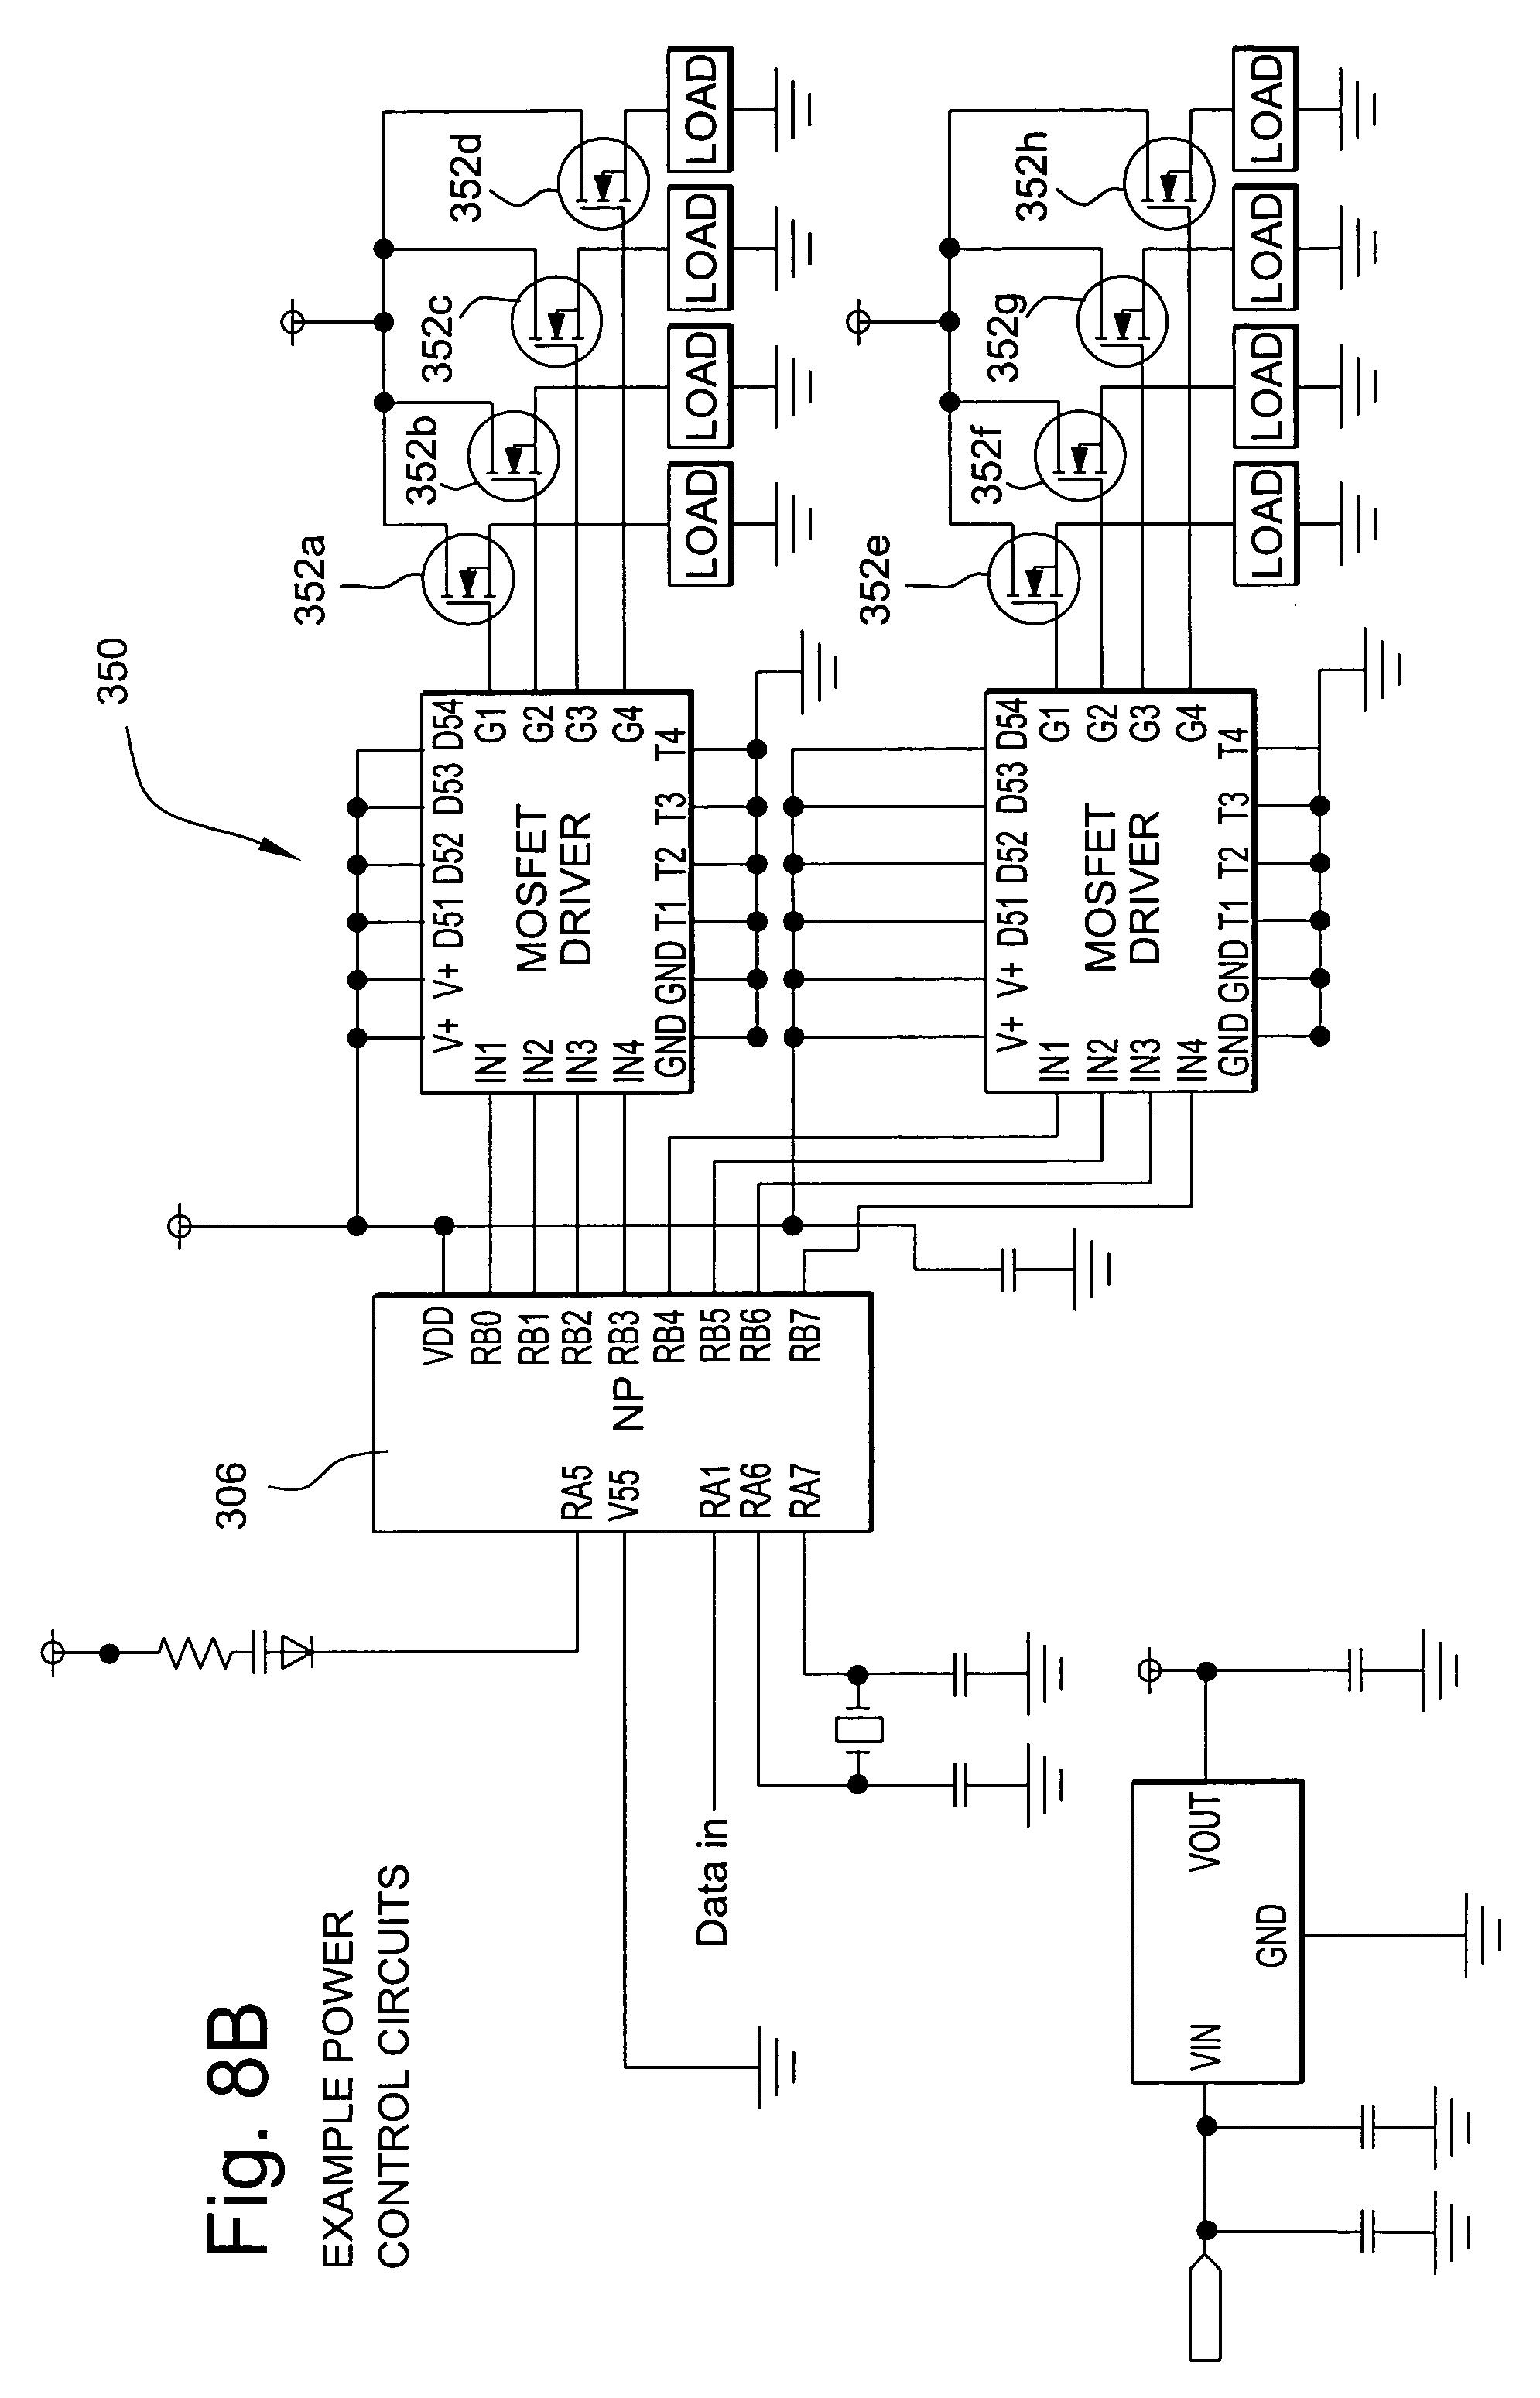 Code 3 Arrowstick Wiring Diagram Code 3 Parts Wiring